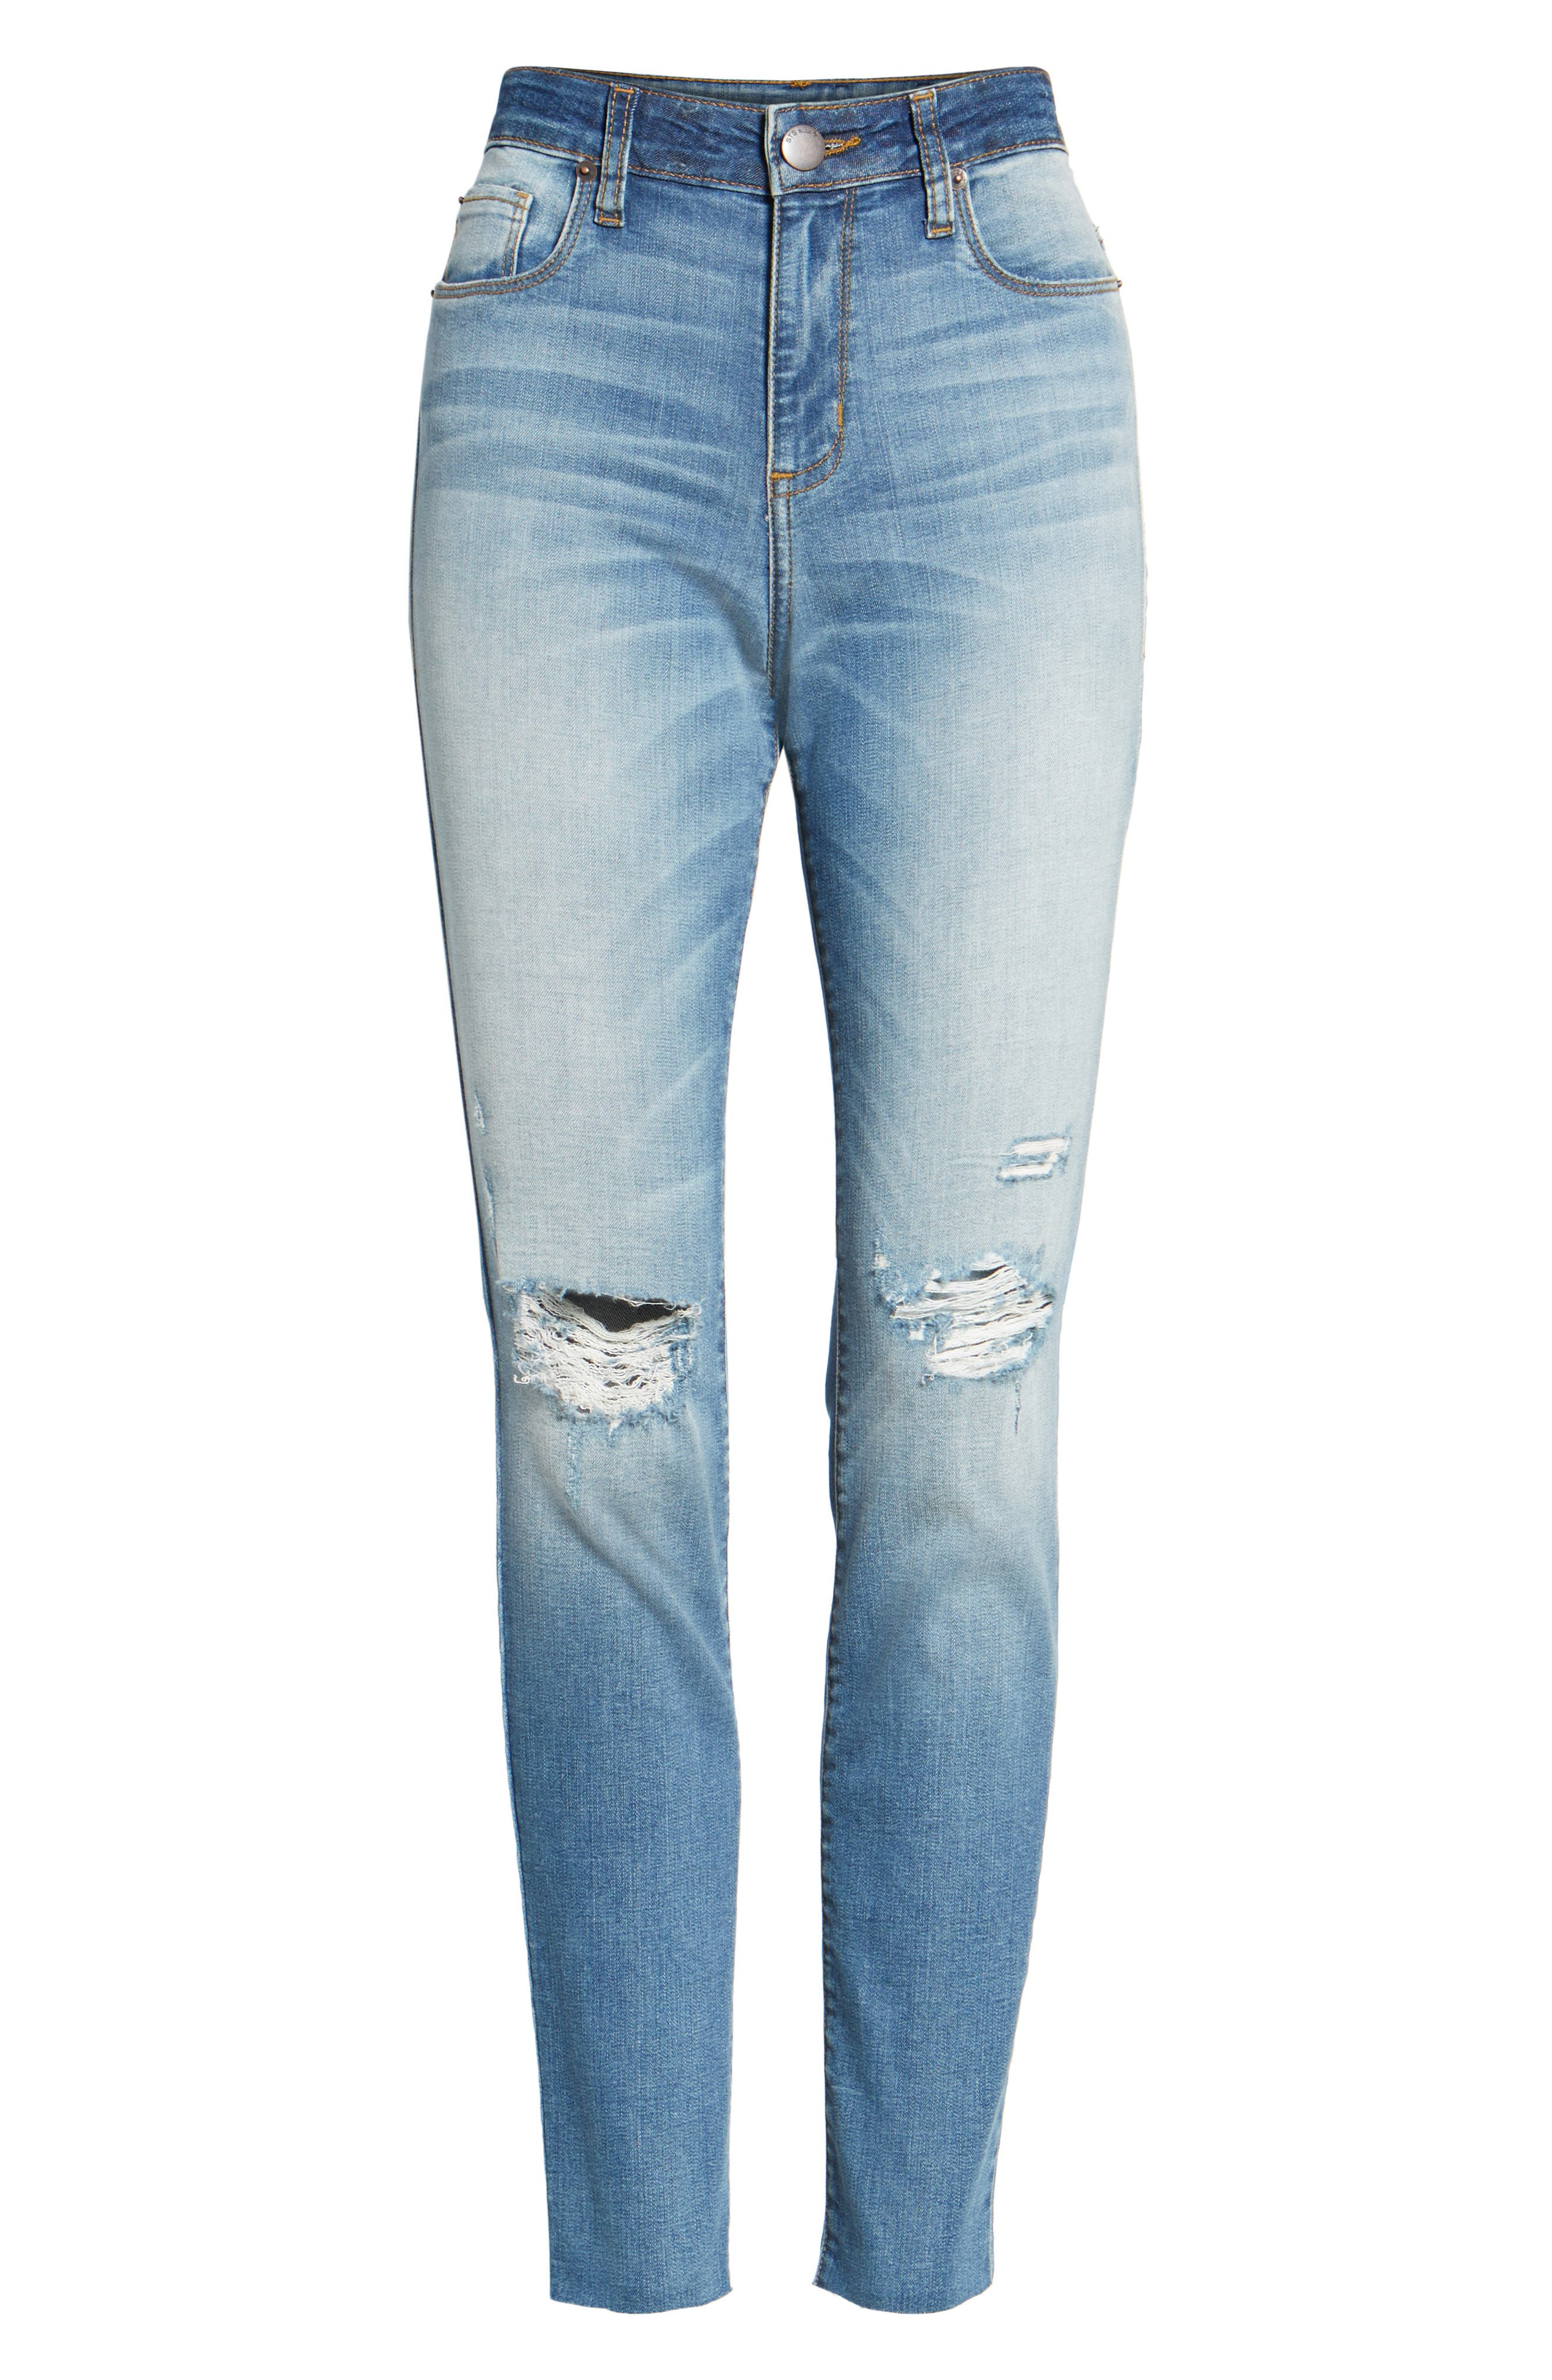 Ellie Ripped High Waist Skinny Jeans,                             Alternate thumbnail 6, color,                             400